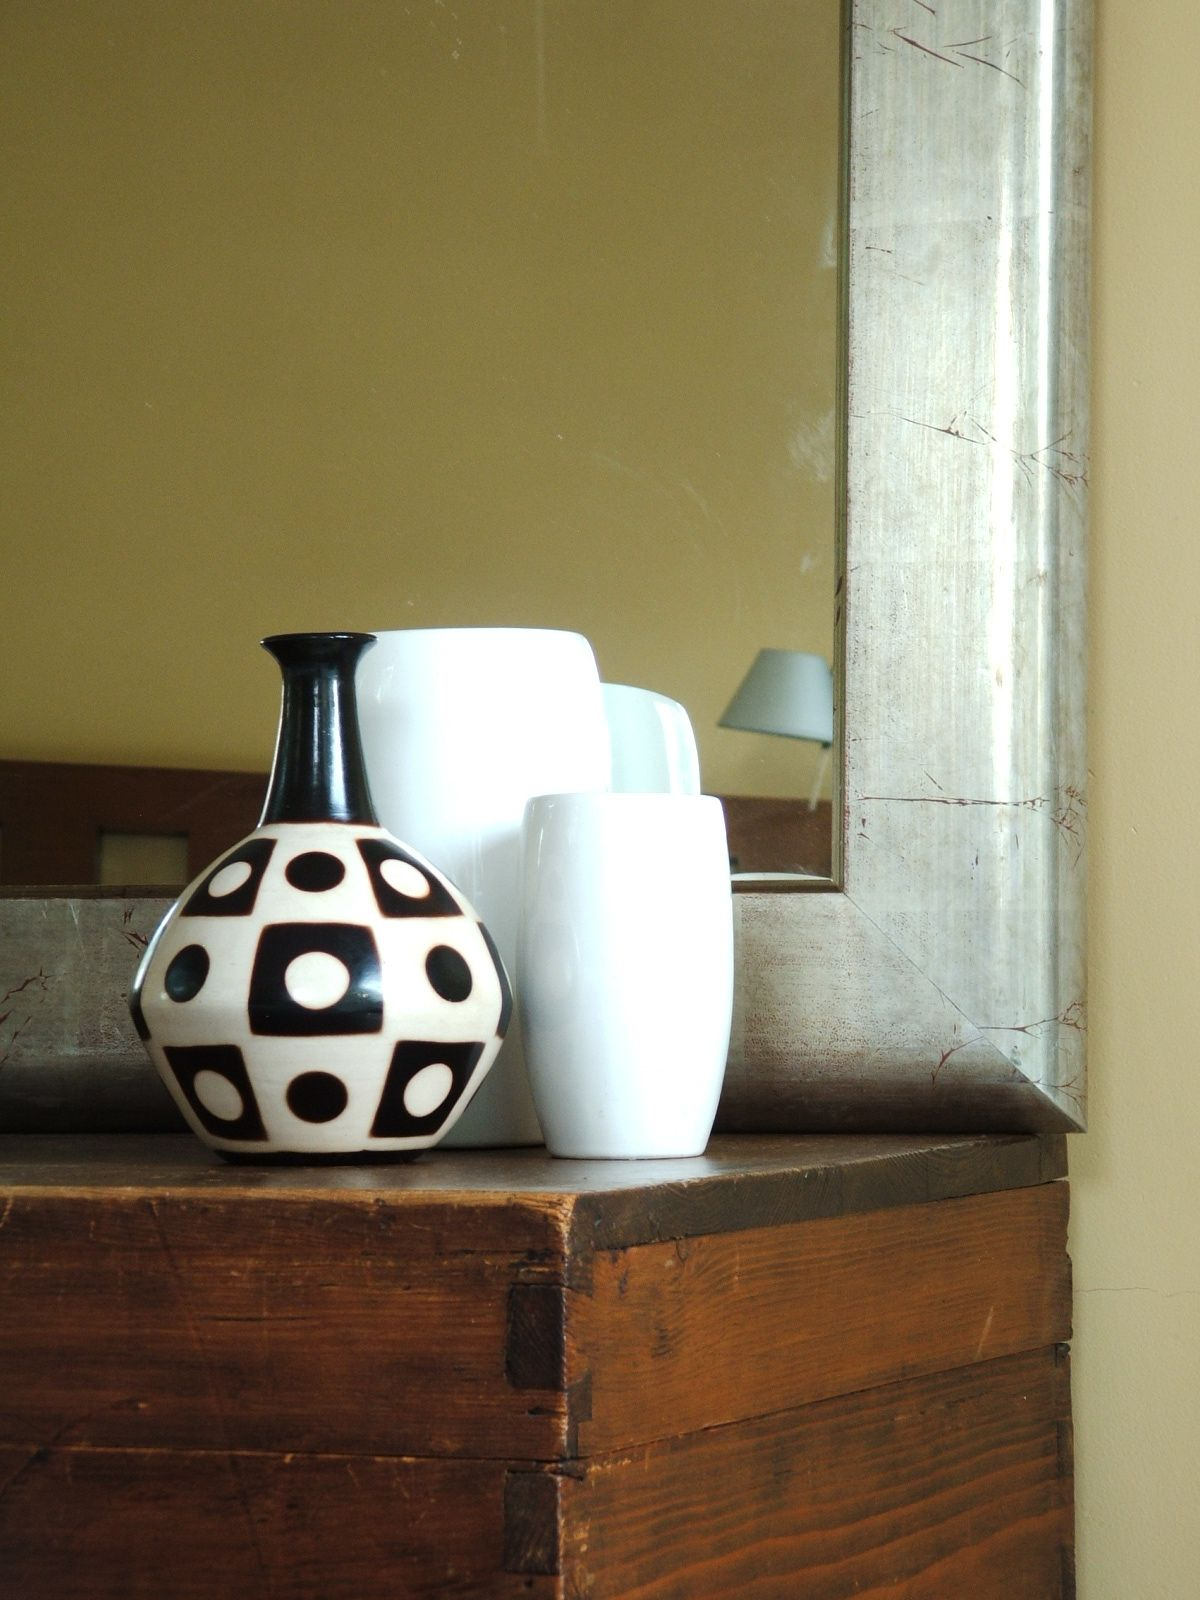 Espejo con marco bomb plateado a la hoja ideas marcos - Espejos con marco plateado ...